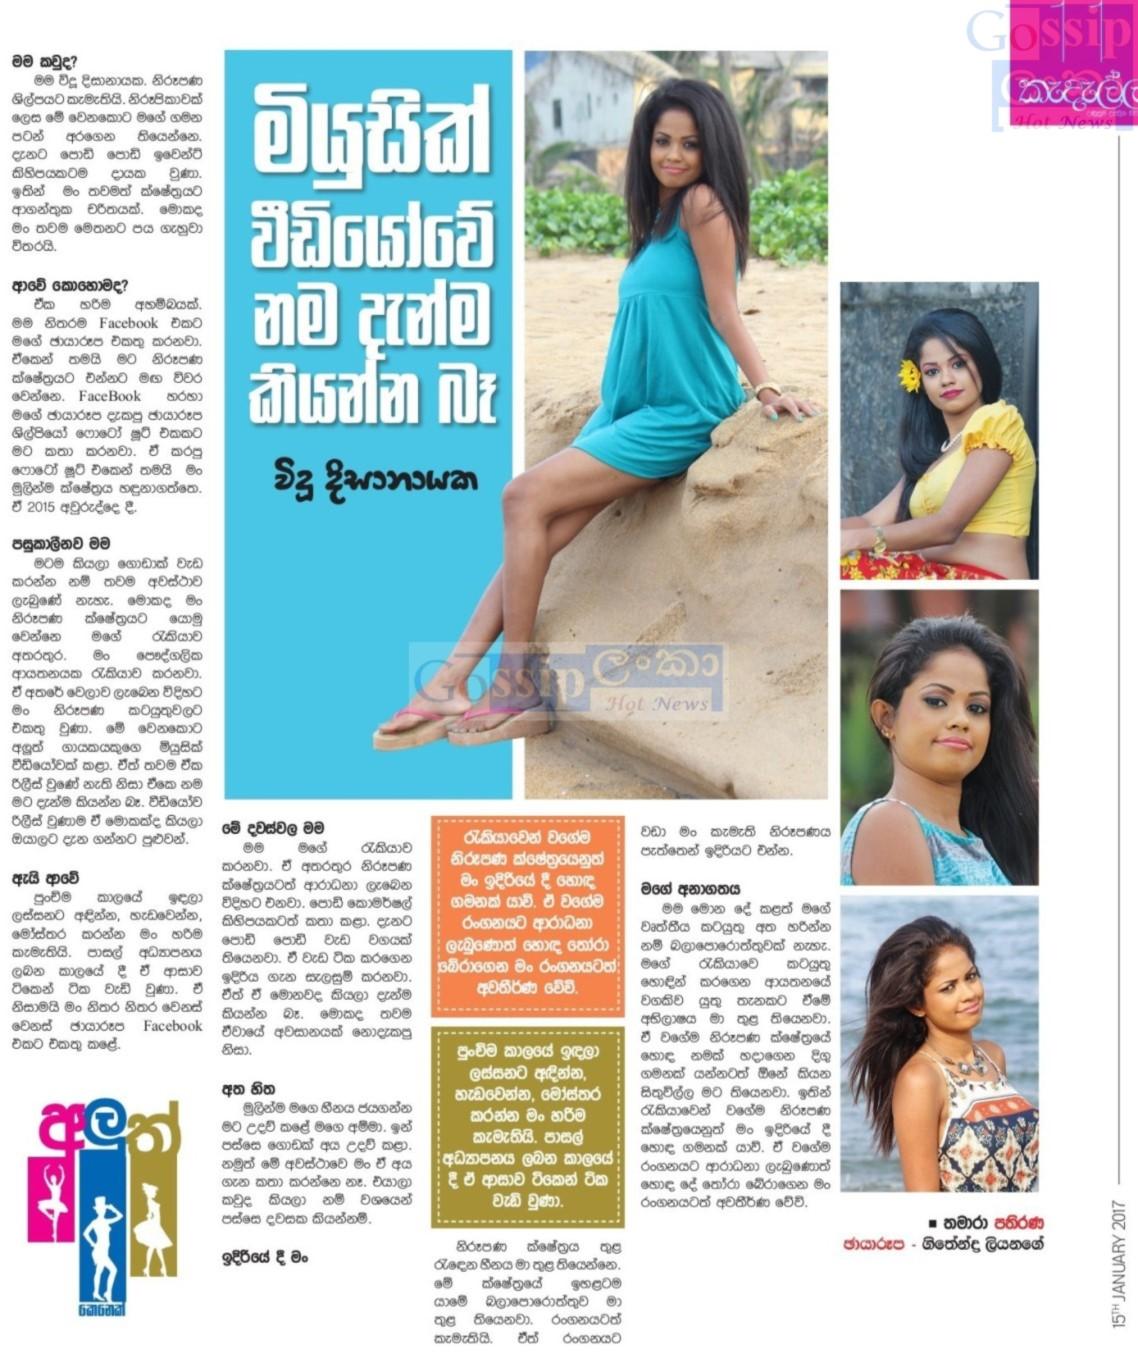 Gossip Chat with Vidu Dissanayake